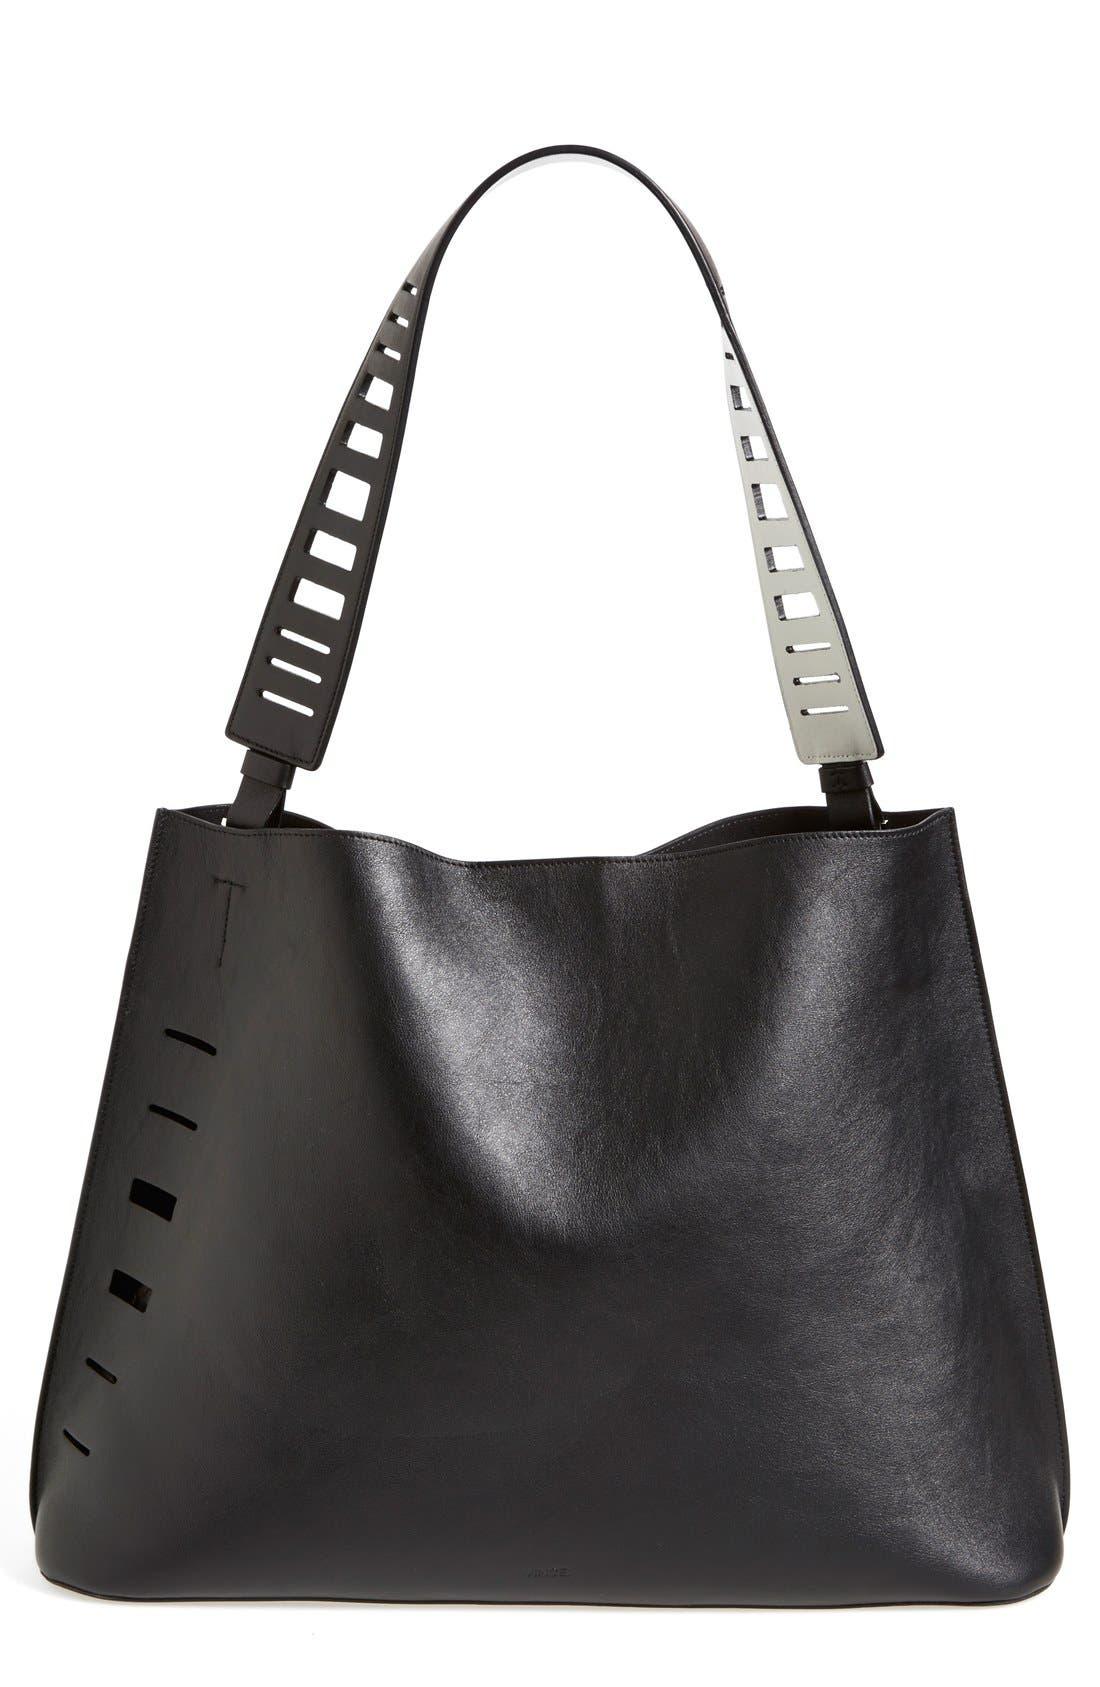 Alternate Image 1 Selected - Vince 'Medium' Cutout Leather Hobo